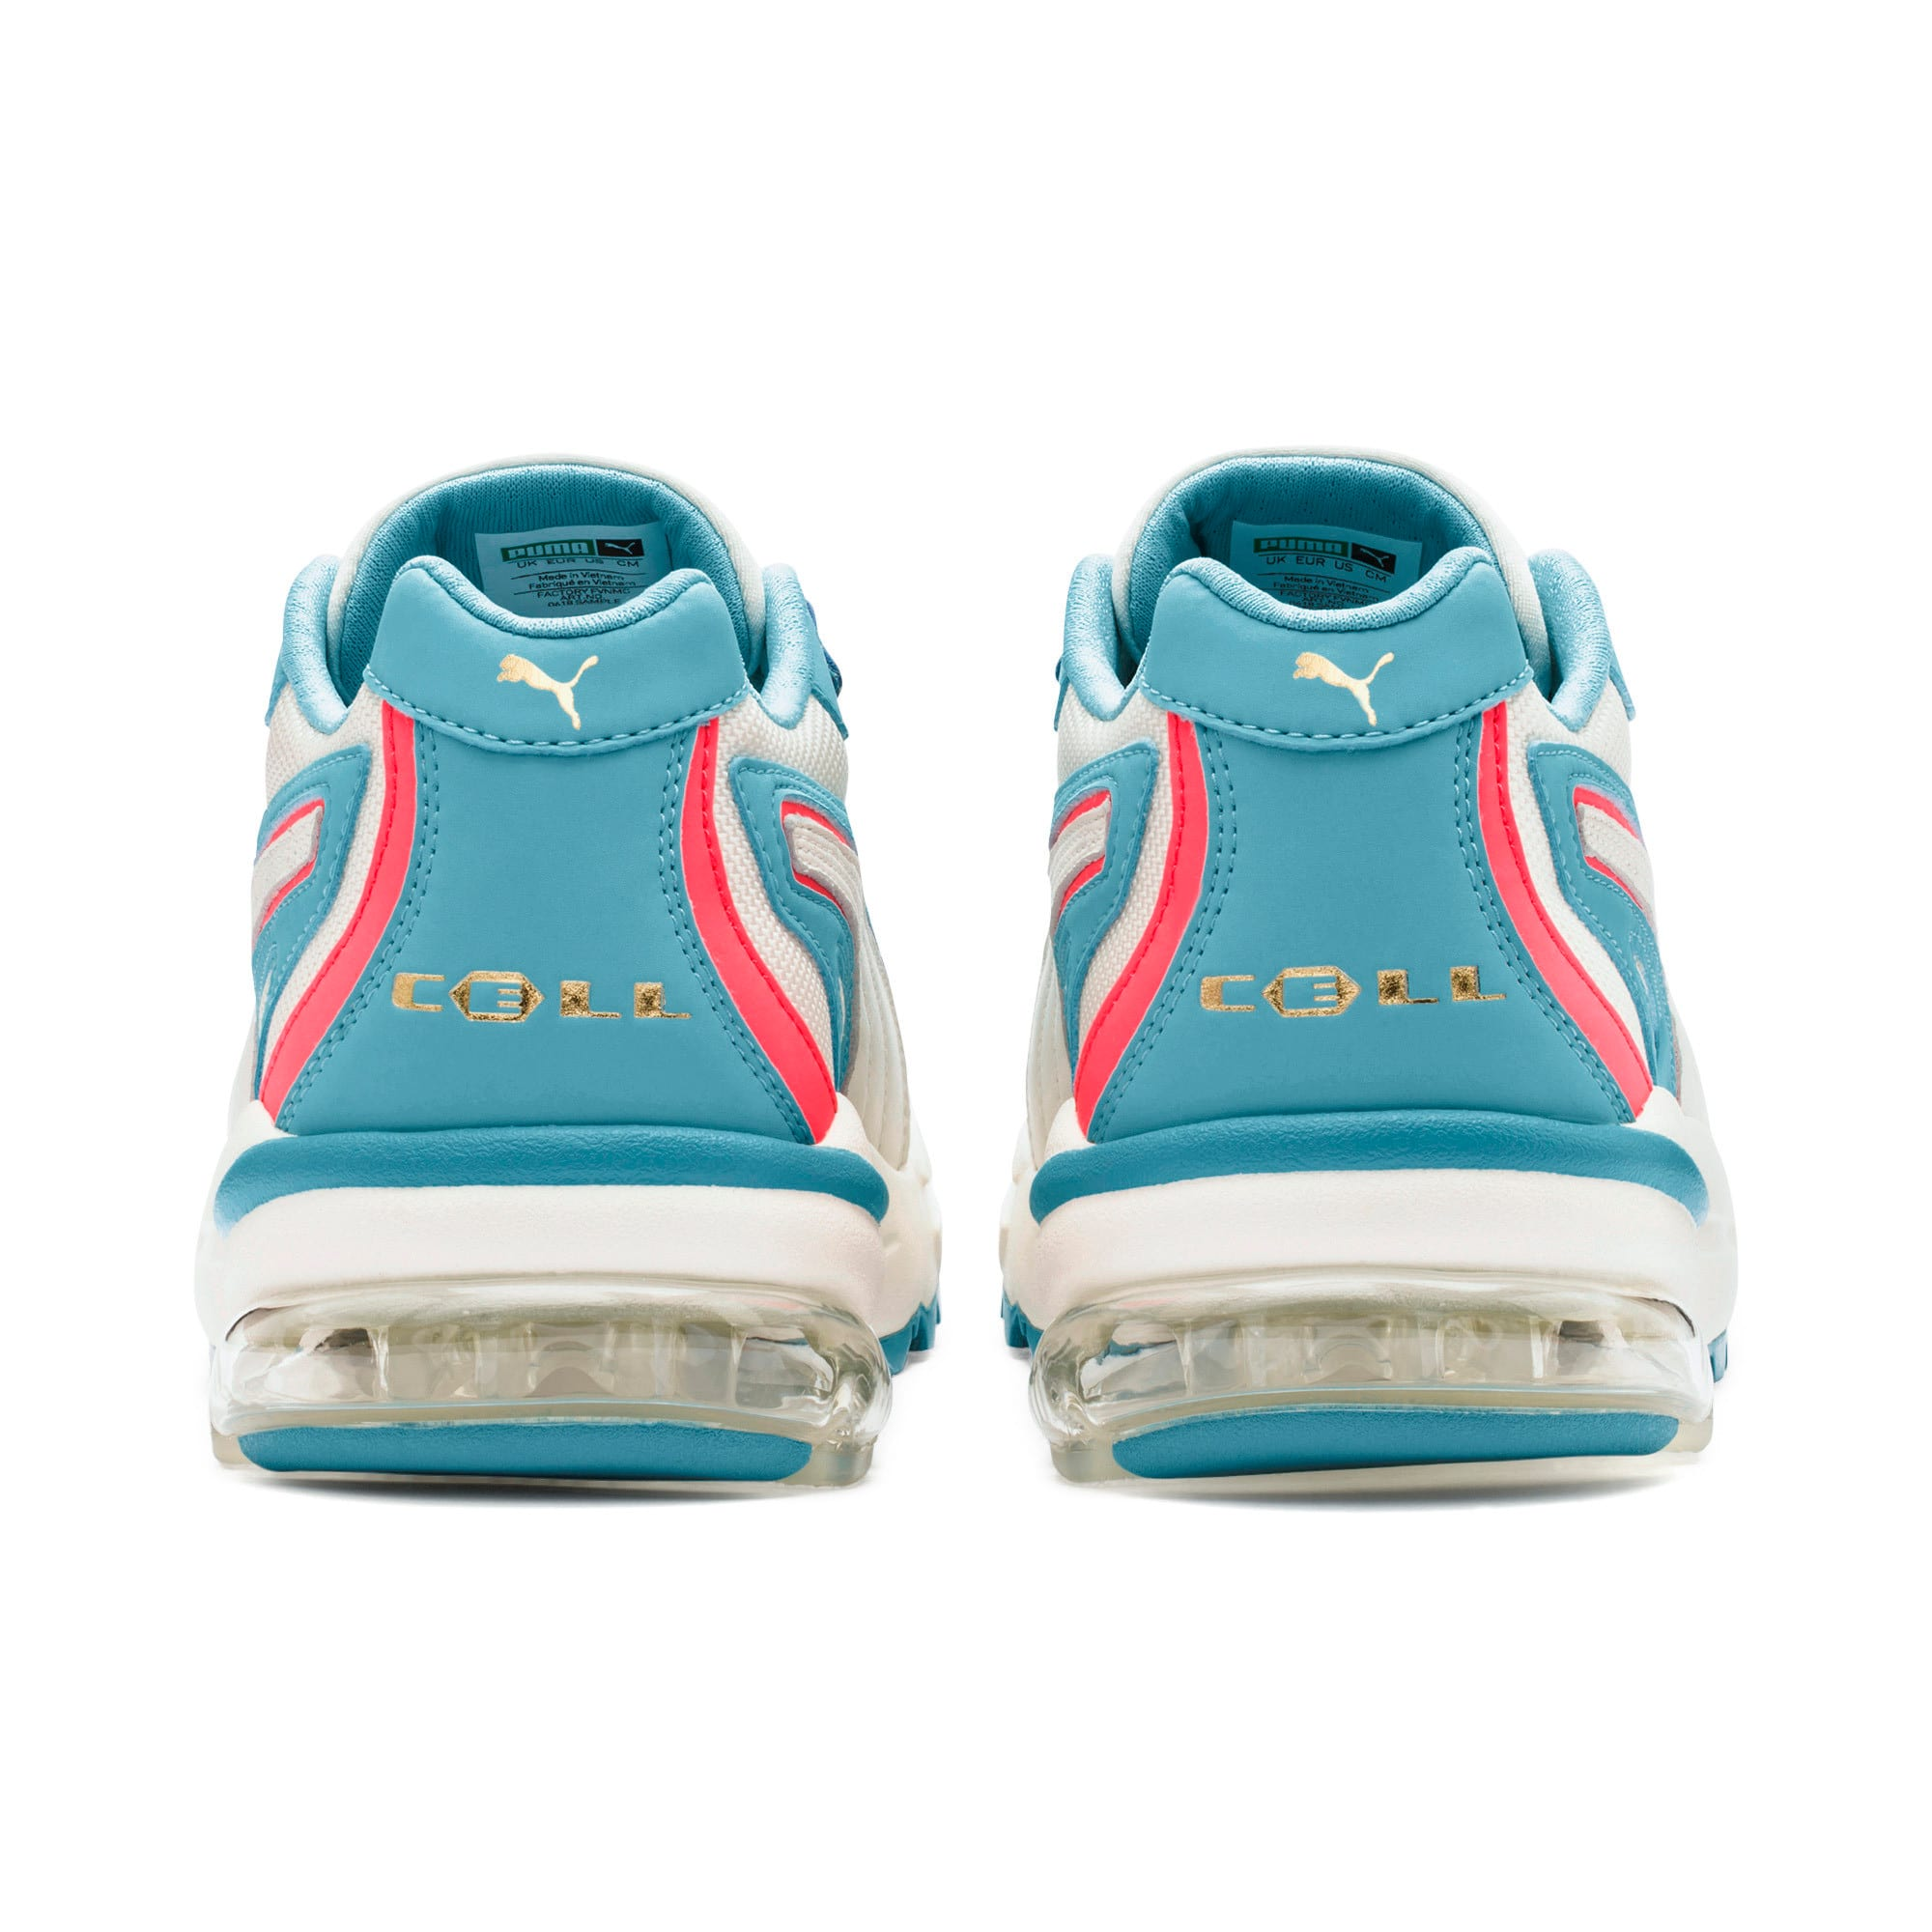 Thumbnail 4 of CELL Stellar Women's Sneakers, Milky Blue-Puma Team Gold, medium